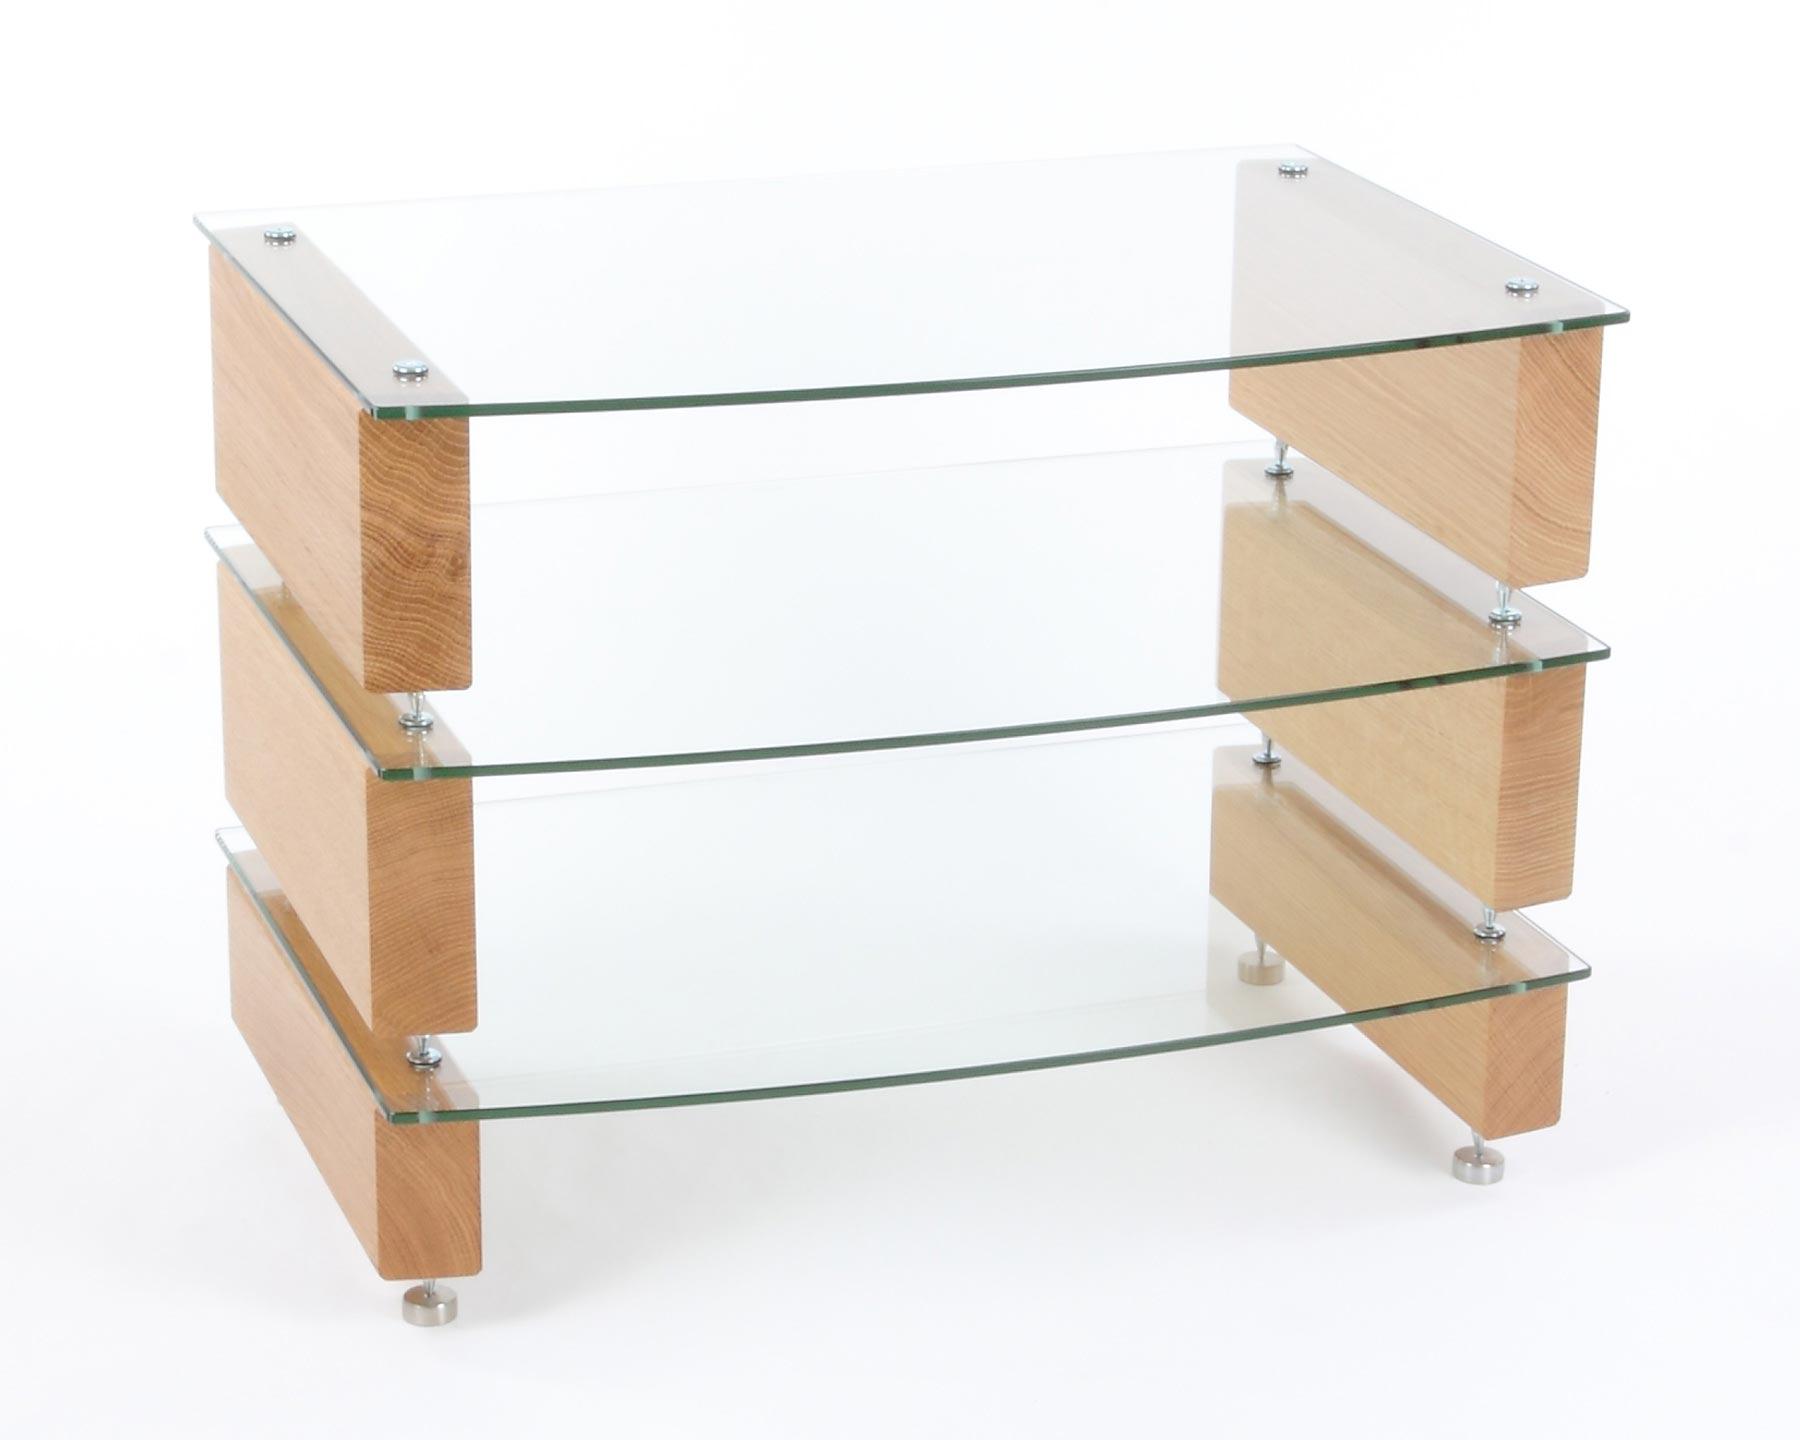 custom design hifi rack milan 6 hifi 3 eiche klarem glas bellevue audio gmbh. Black Bedroom Furniture Sets. Home Design Ideas